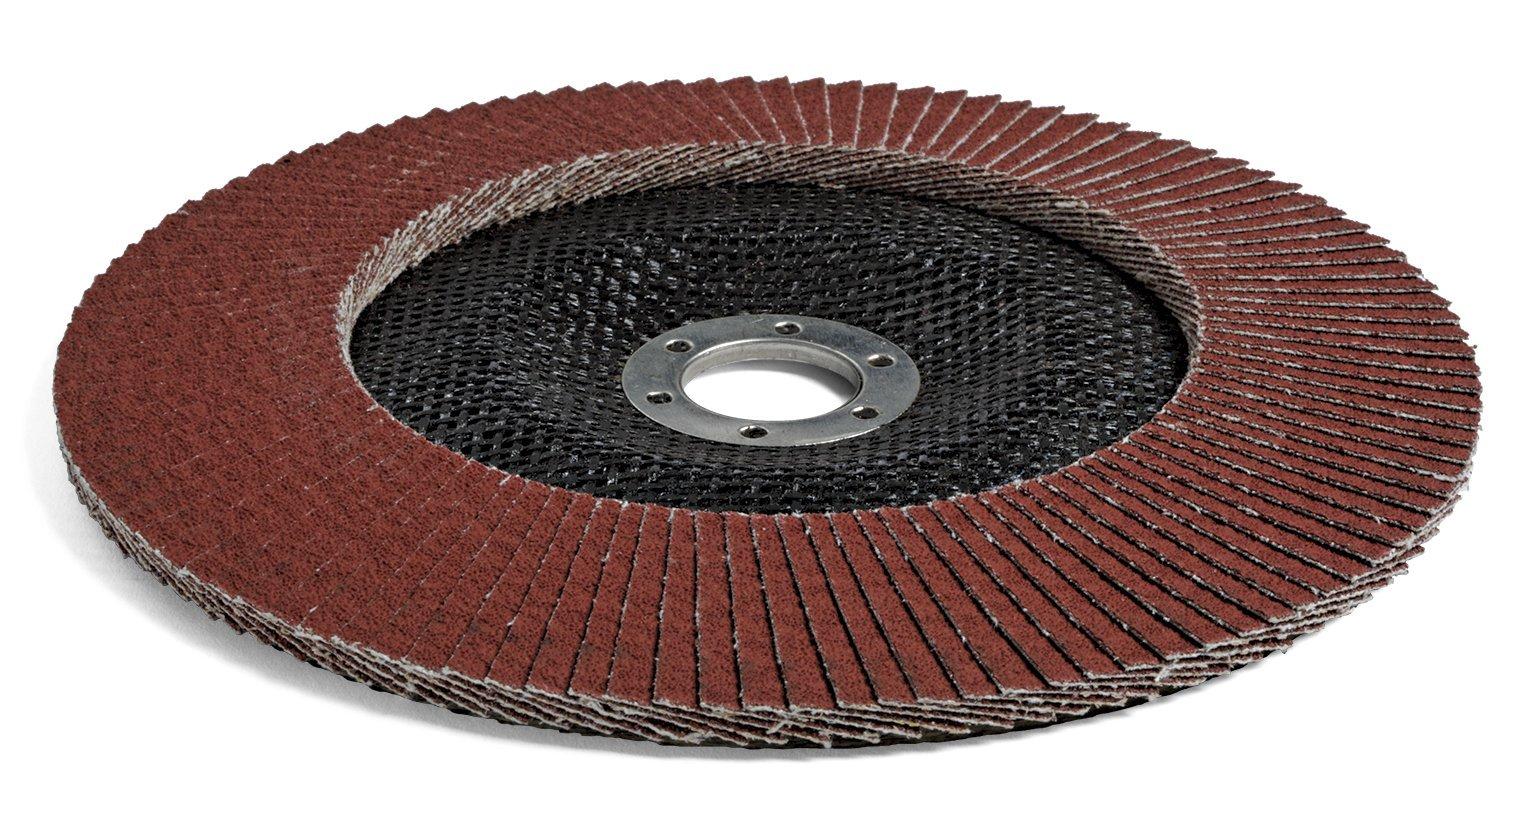 3M Cubitron II Flap Disc 967A, Type 29, Cloth, Ceramic Grain, 7'' Diameter, 40+ Grit, Brown (Pack of 5)